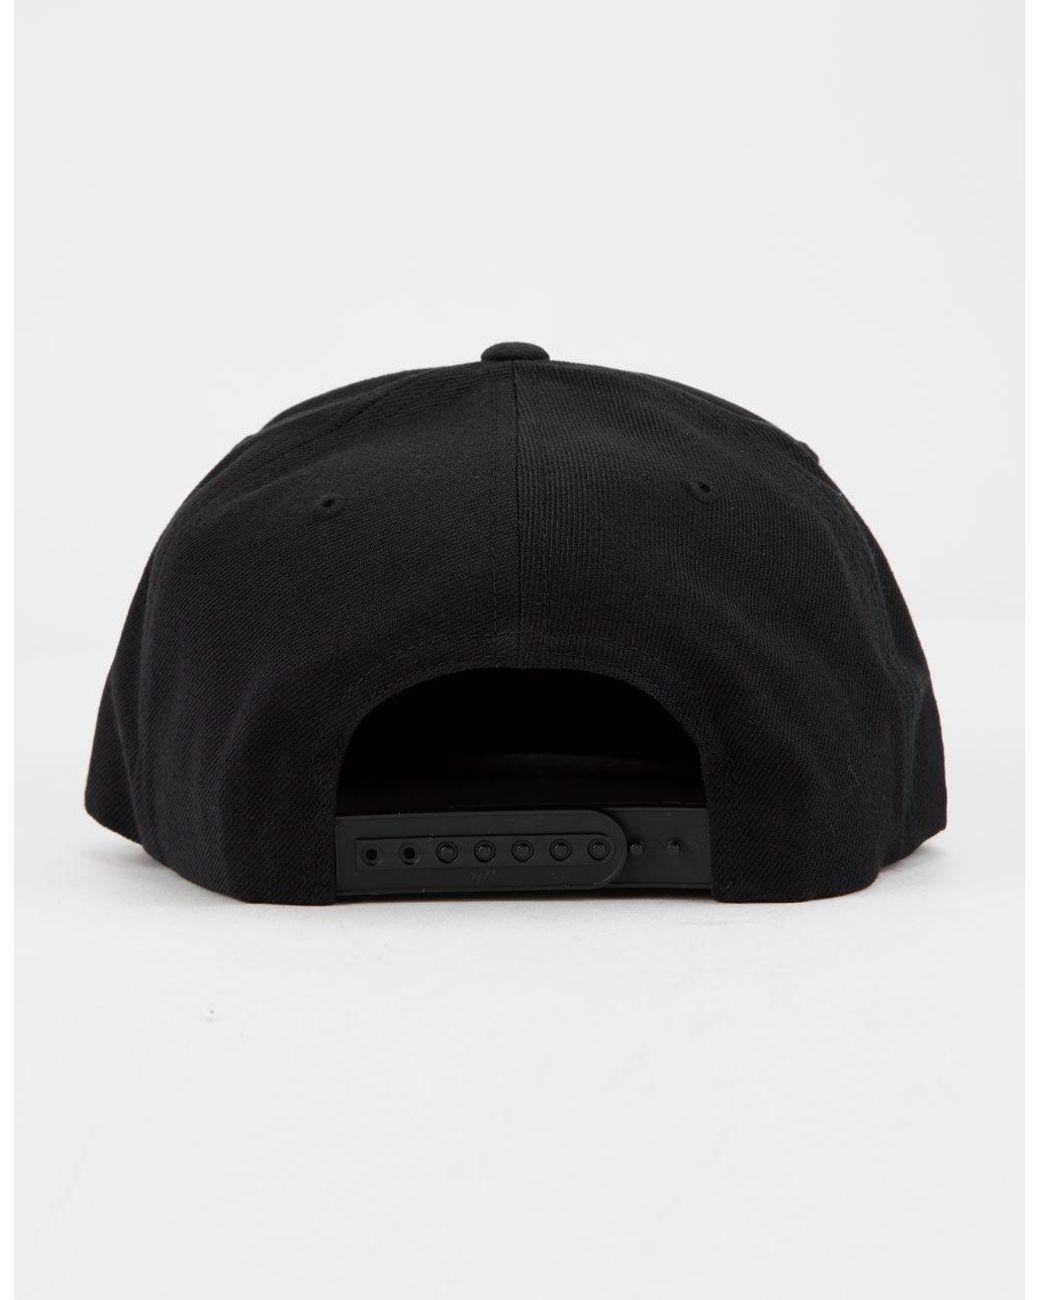 6995d7e7dacf41 Rip Curl Valley Badge Black Mens Snapback Hat in Black for Men - Lyst